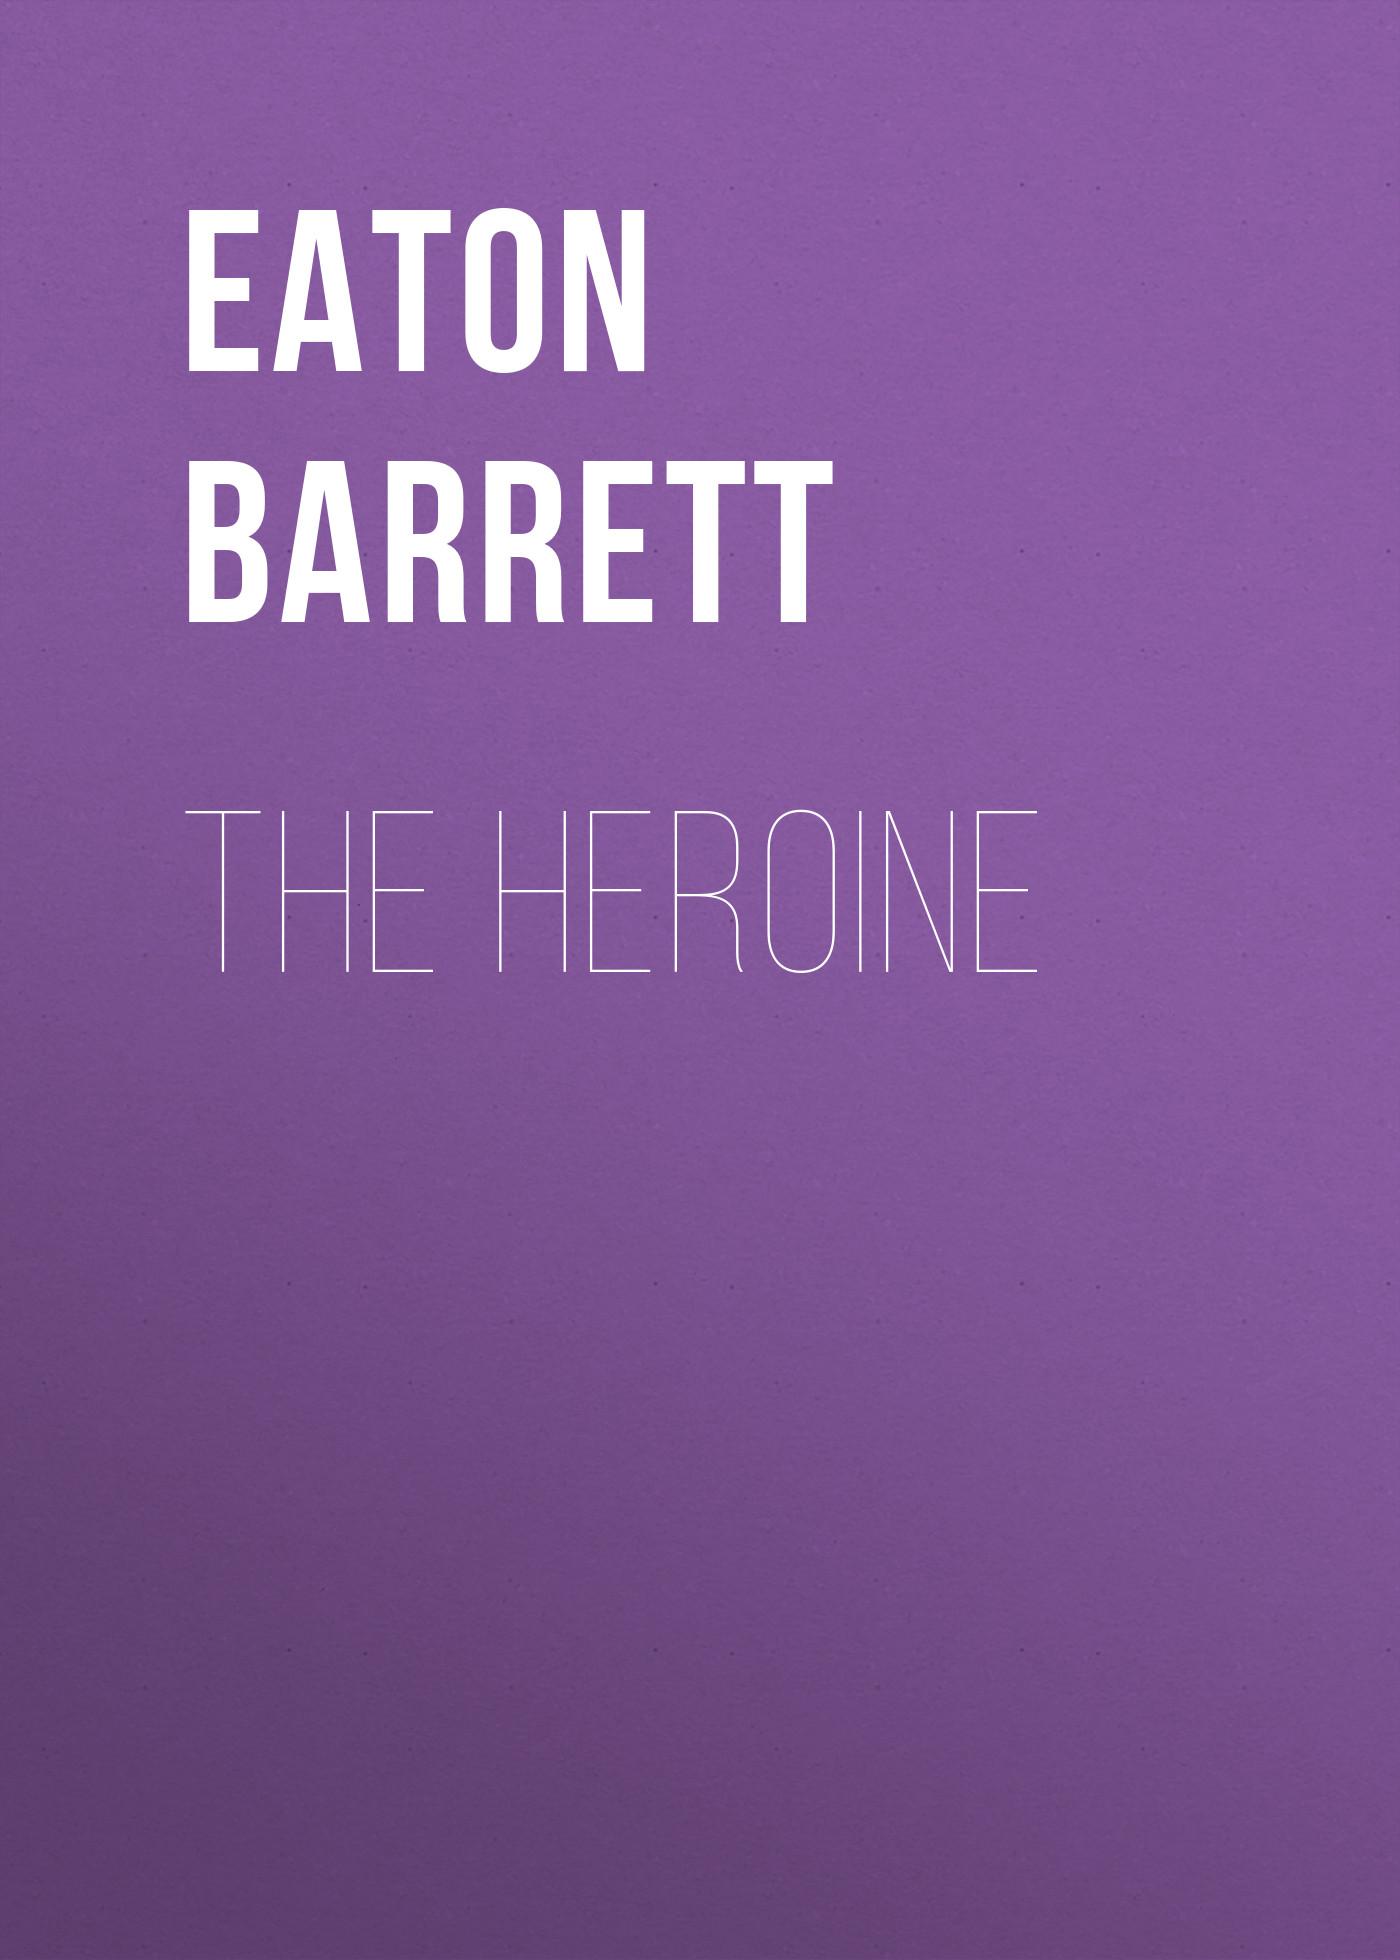 Barrett Eaton Stannard The Heroine barrett eaton stannard the heroine